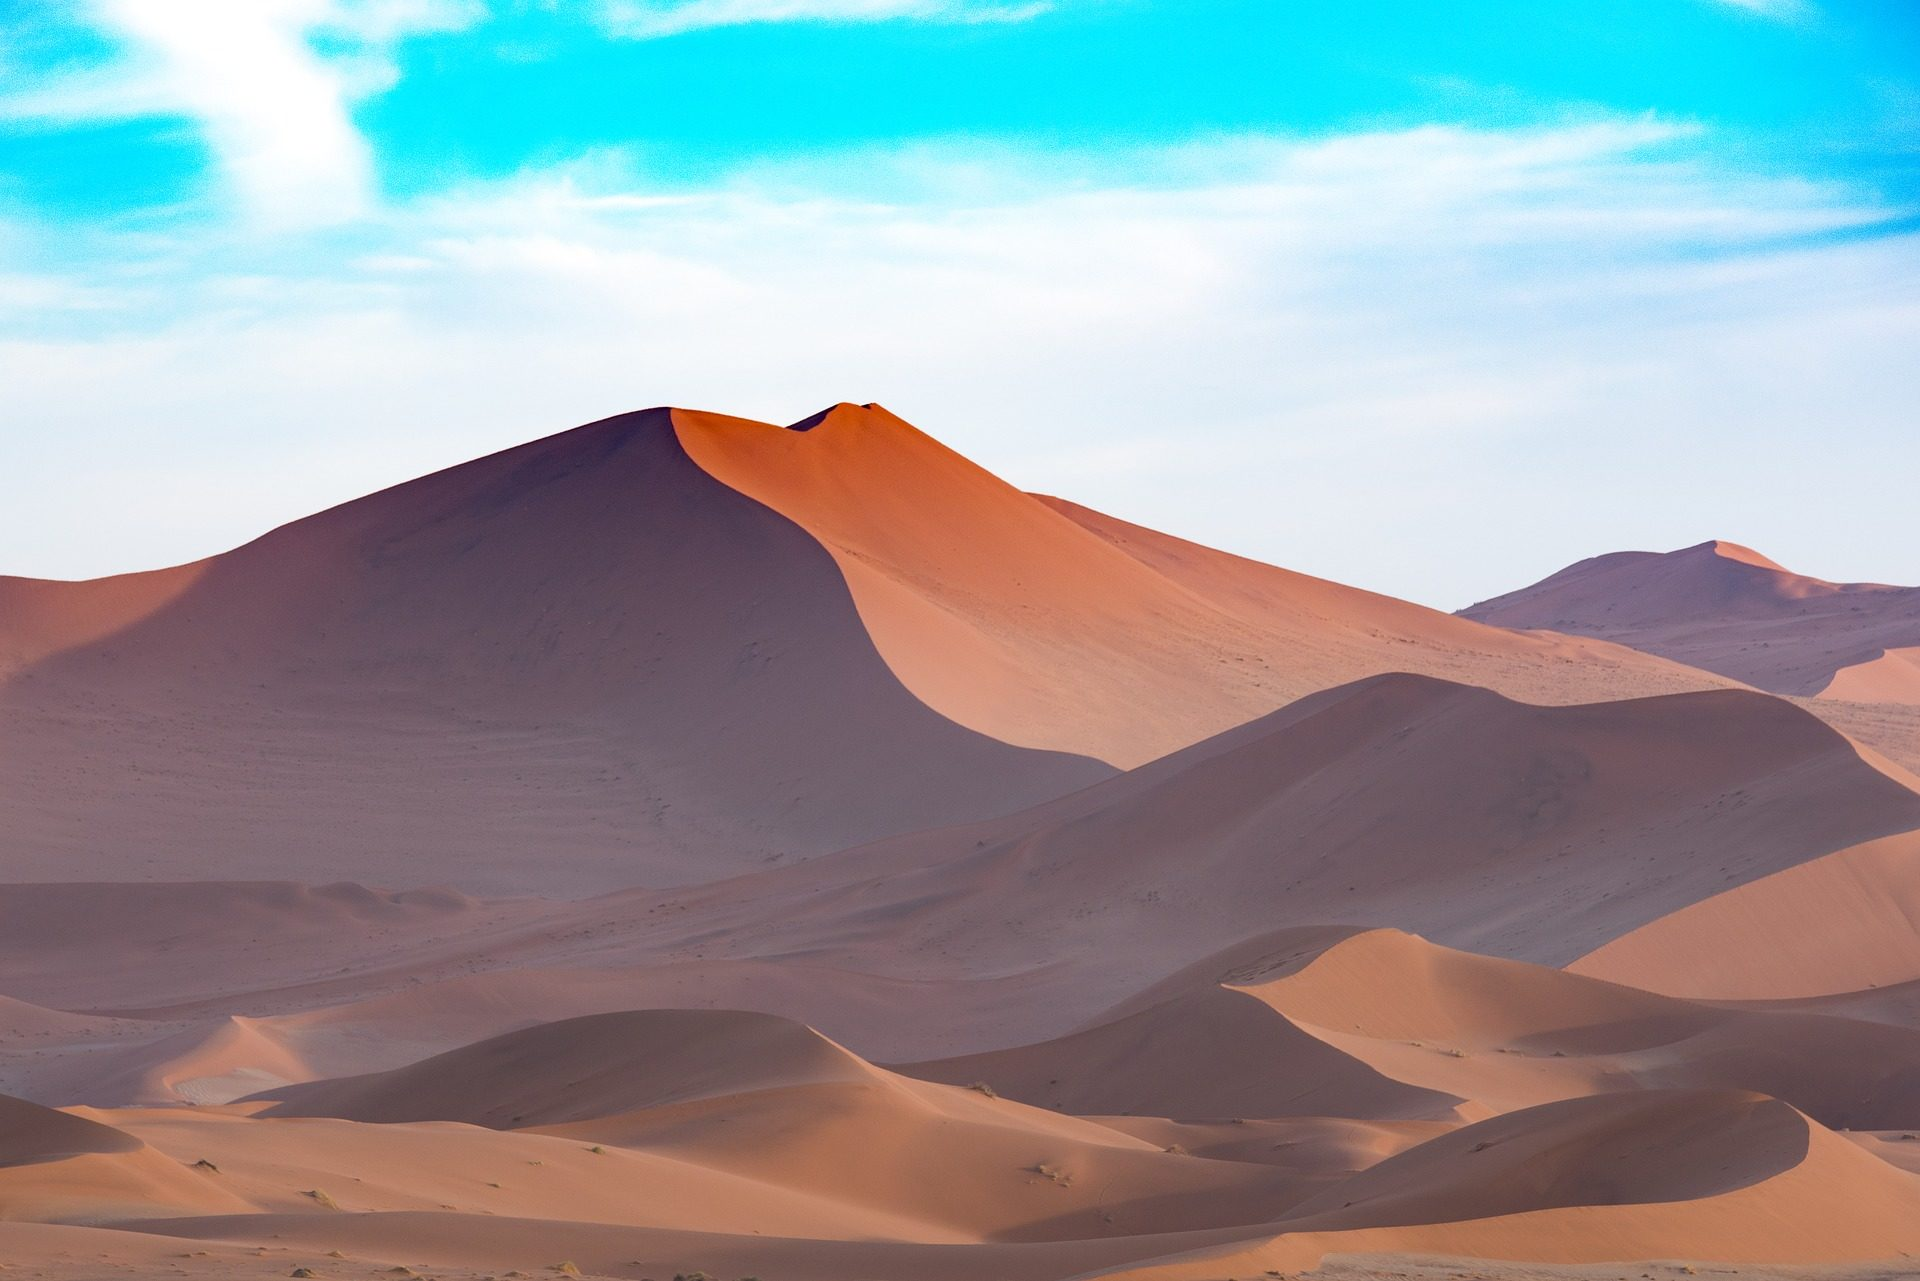 deserto, sabbia, Soledad, siccità, Cielo, Namibia - Sfondi HD - Professor-falken.com